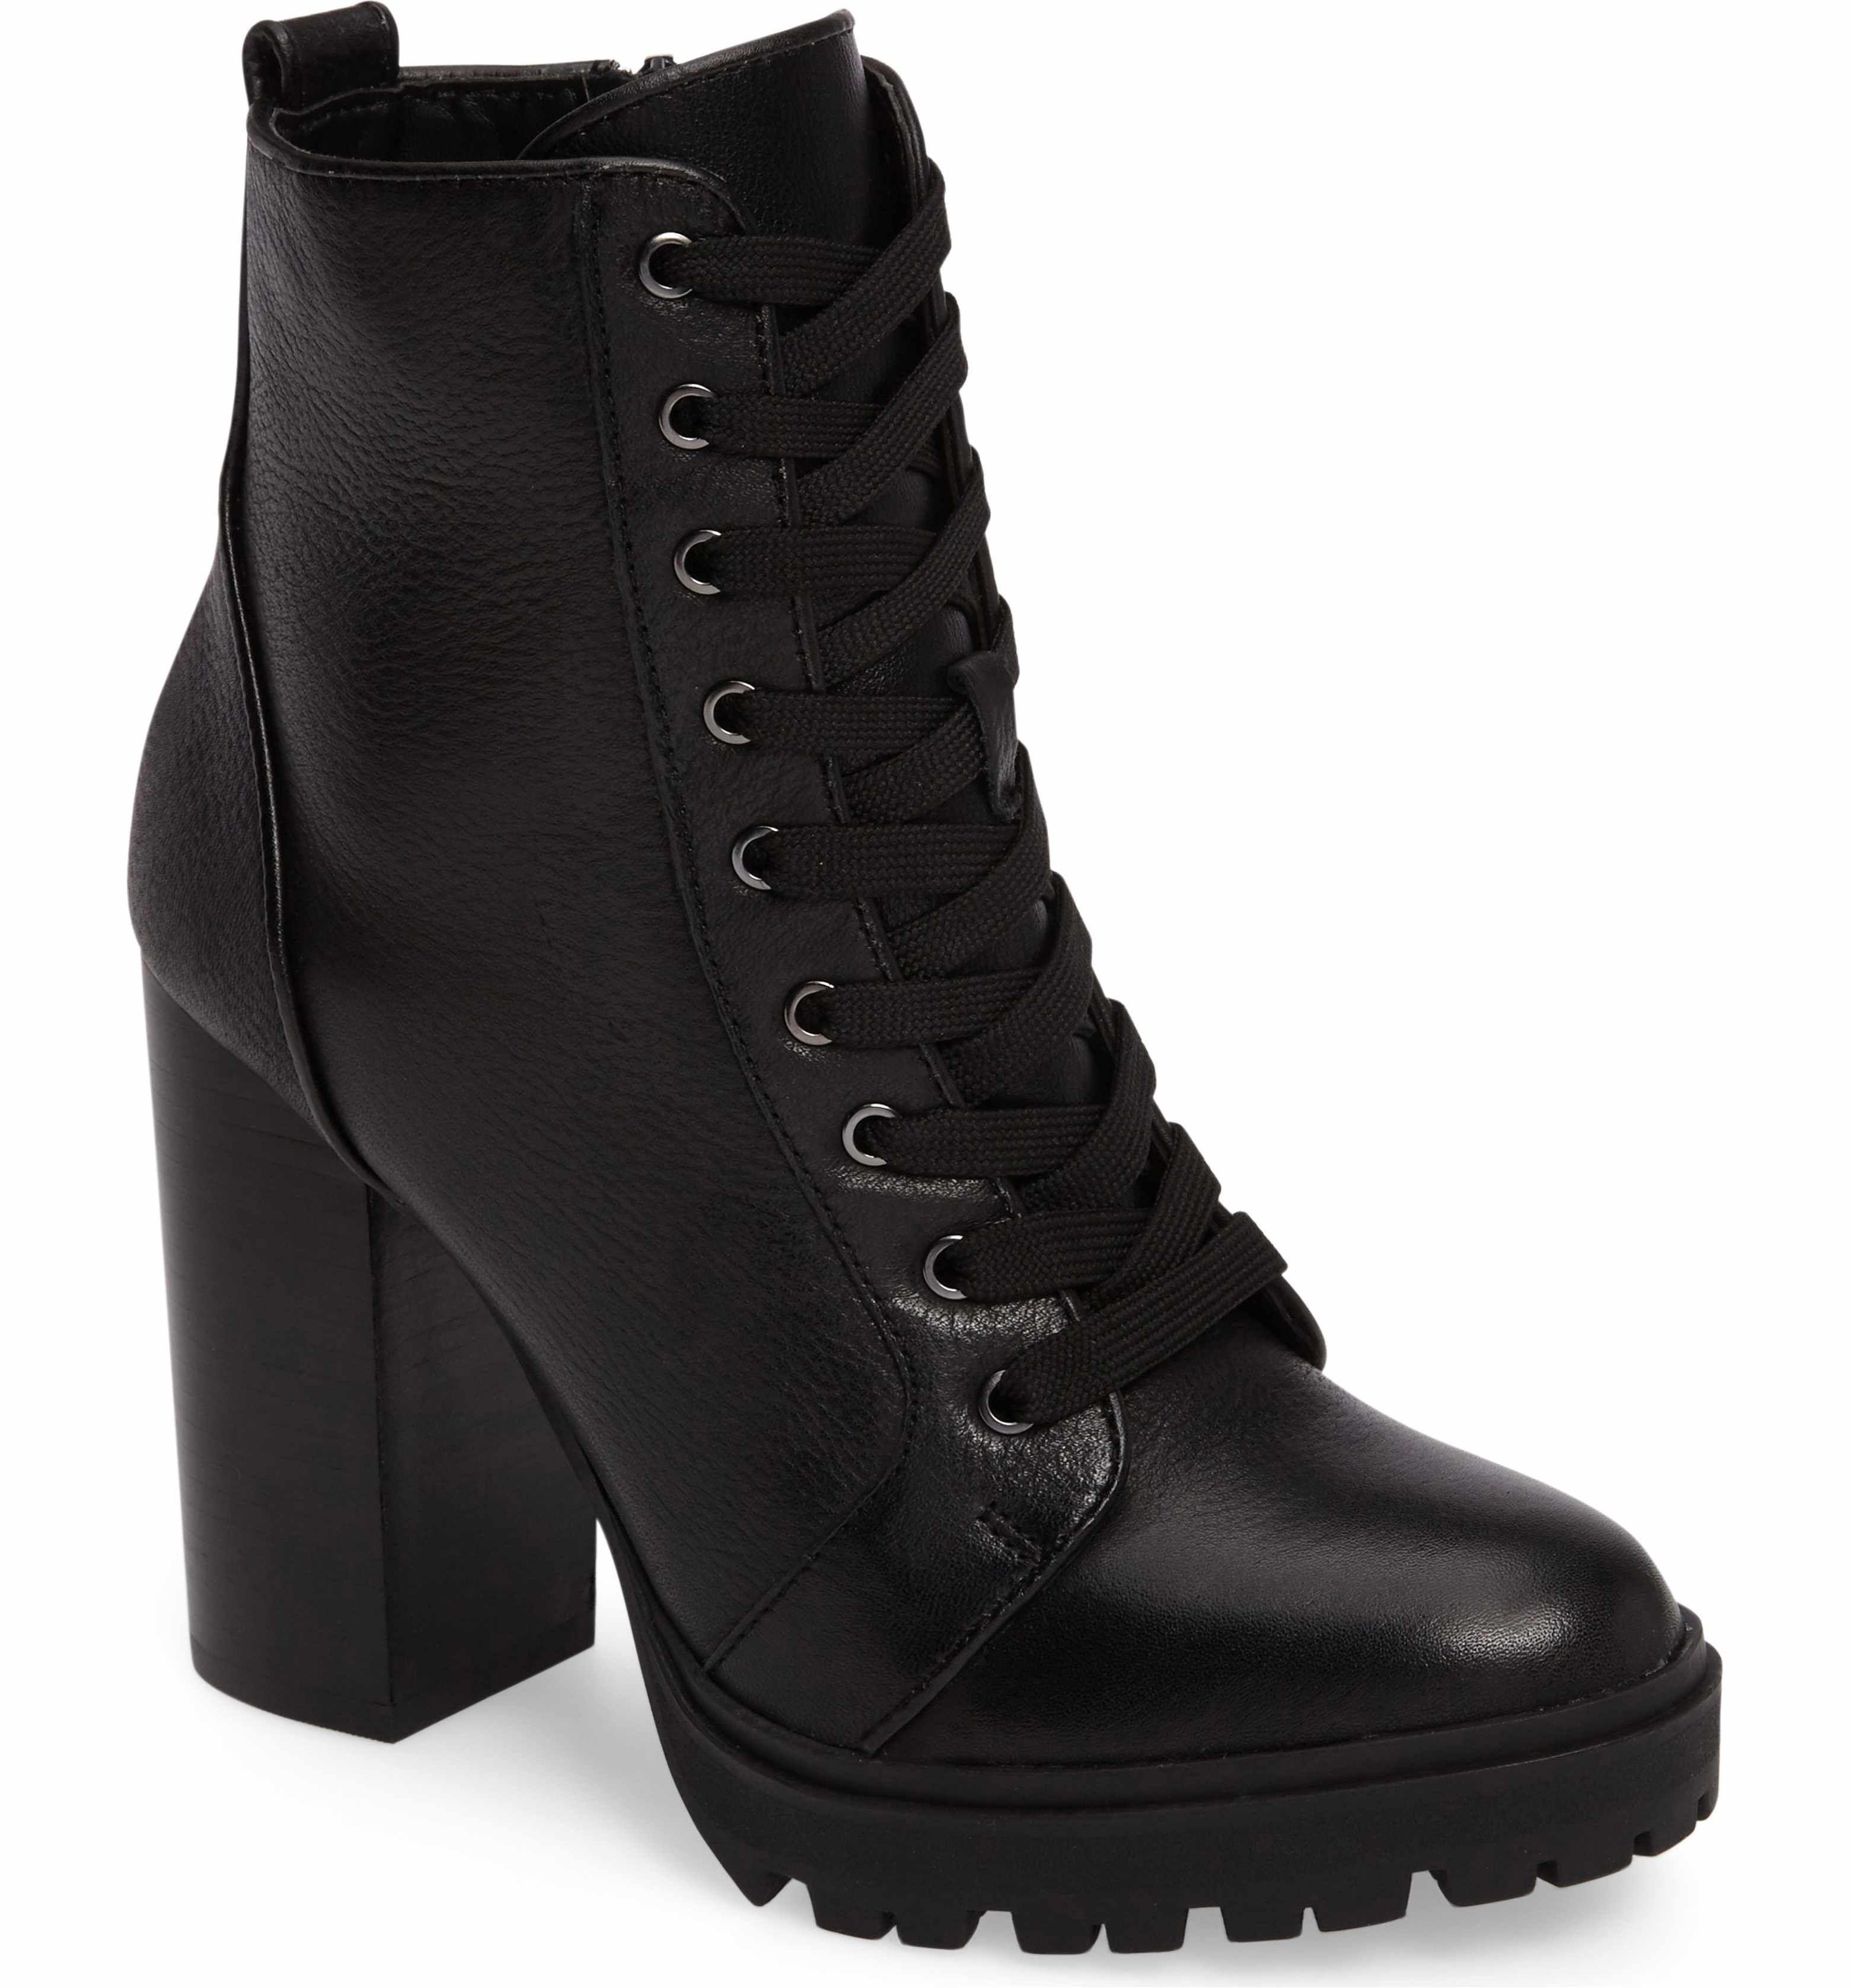 aa6a663e4af Main Image - Steve Madden Laurie Platform Bootie (Women)   shoes ...